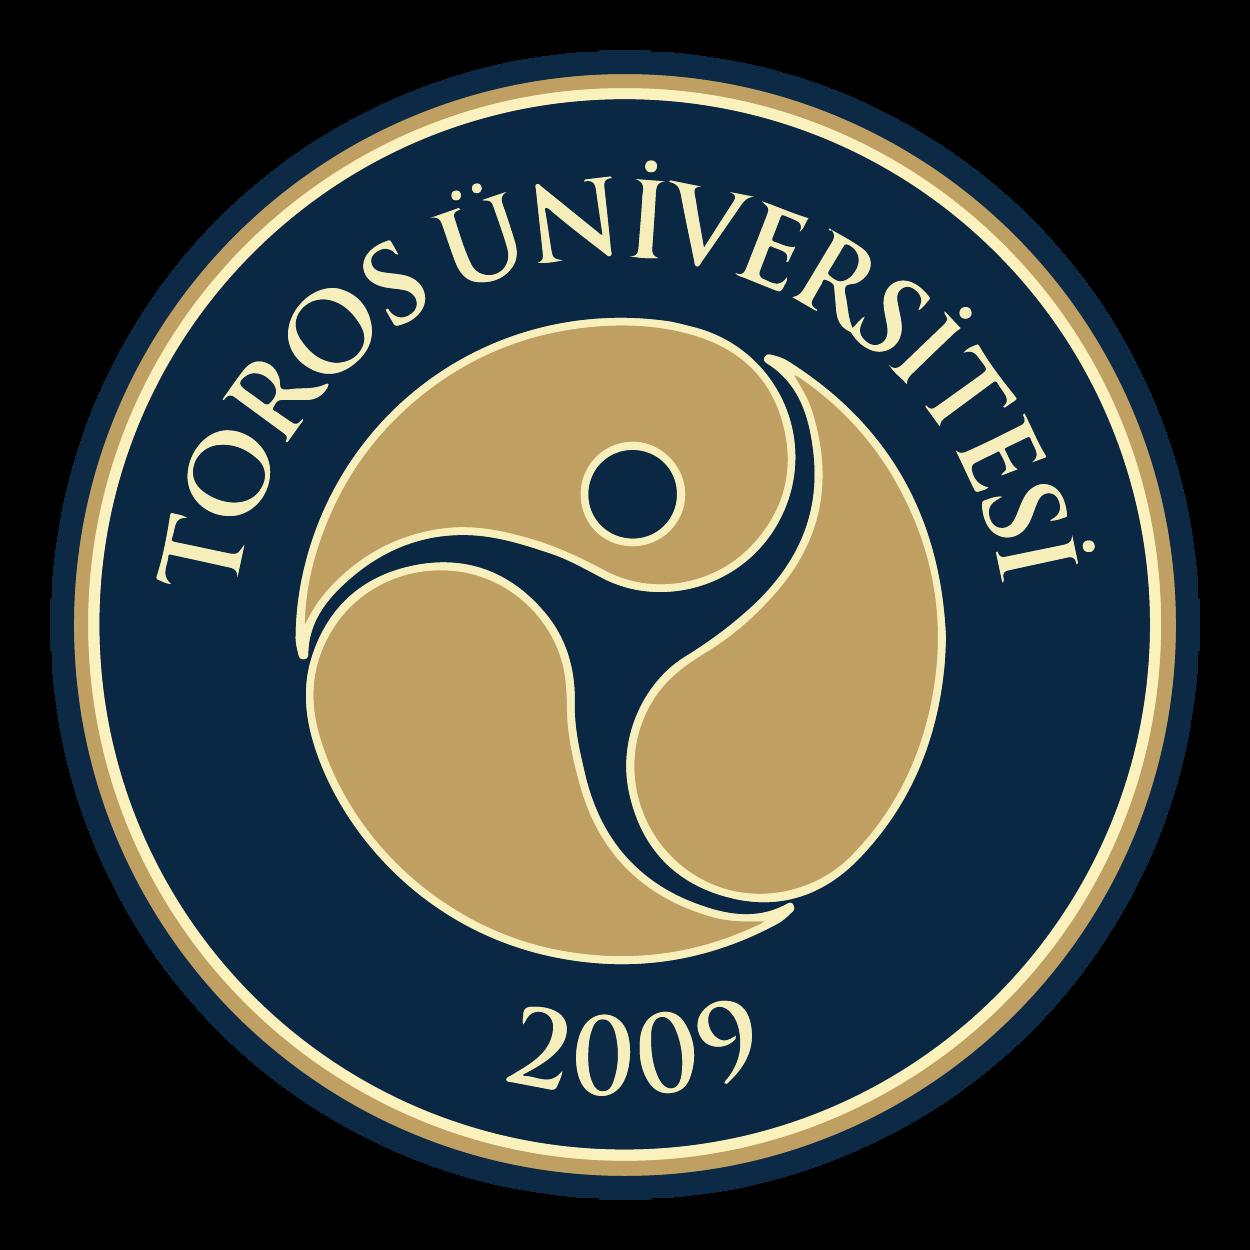 Toros Üniversitesi (Mersin) png